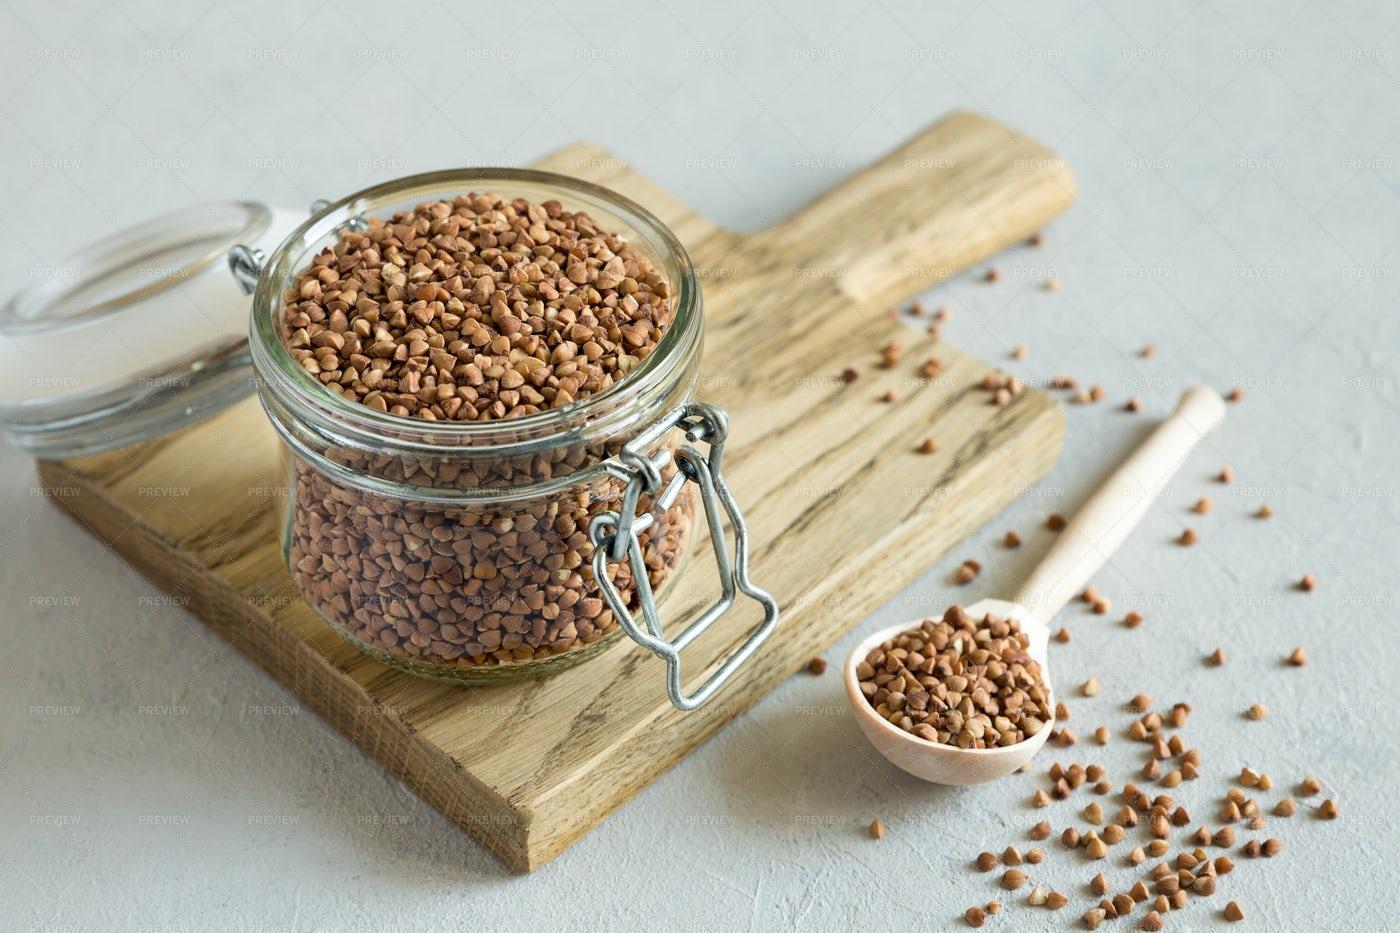 Buckwheat In Glass Jar: Stock Photos